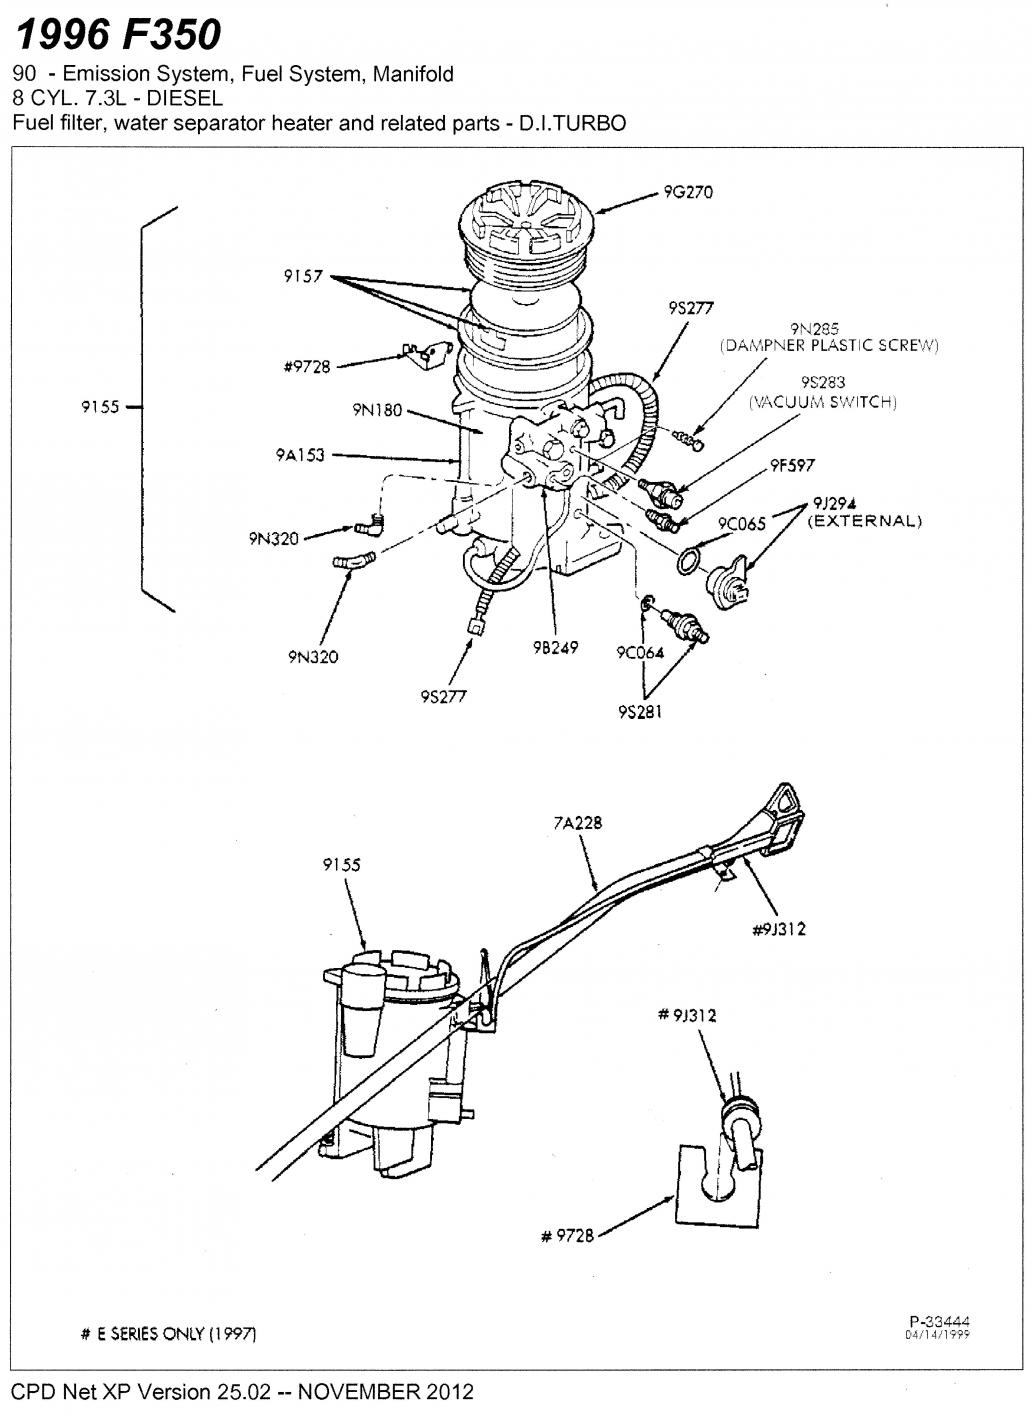 2012 ford f250 diesel fuel filter